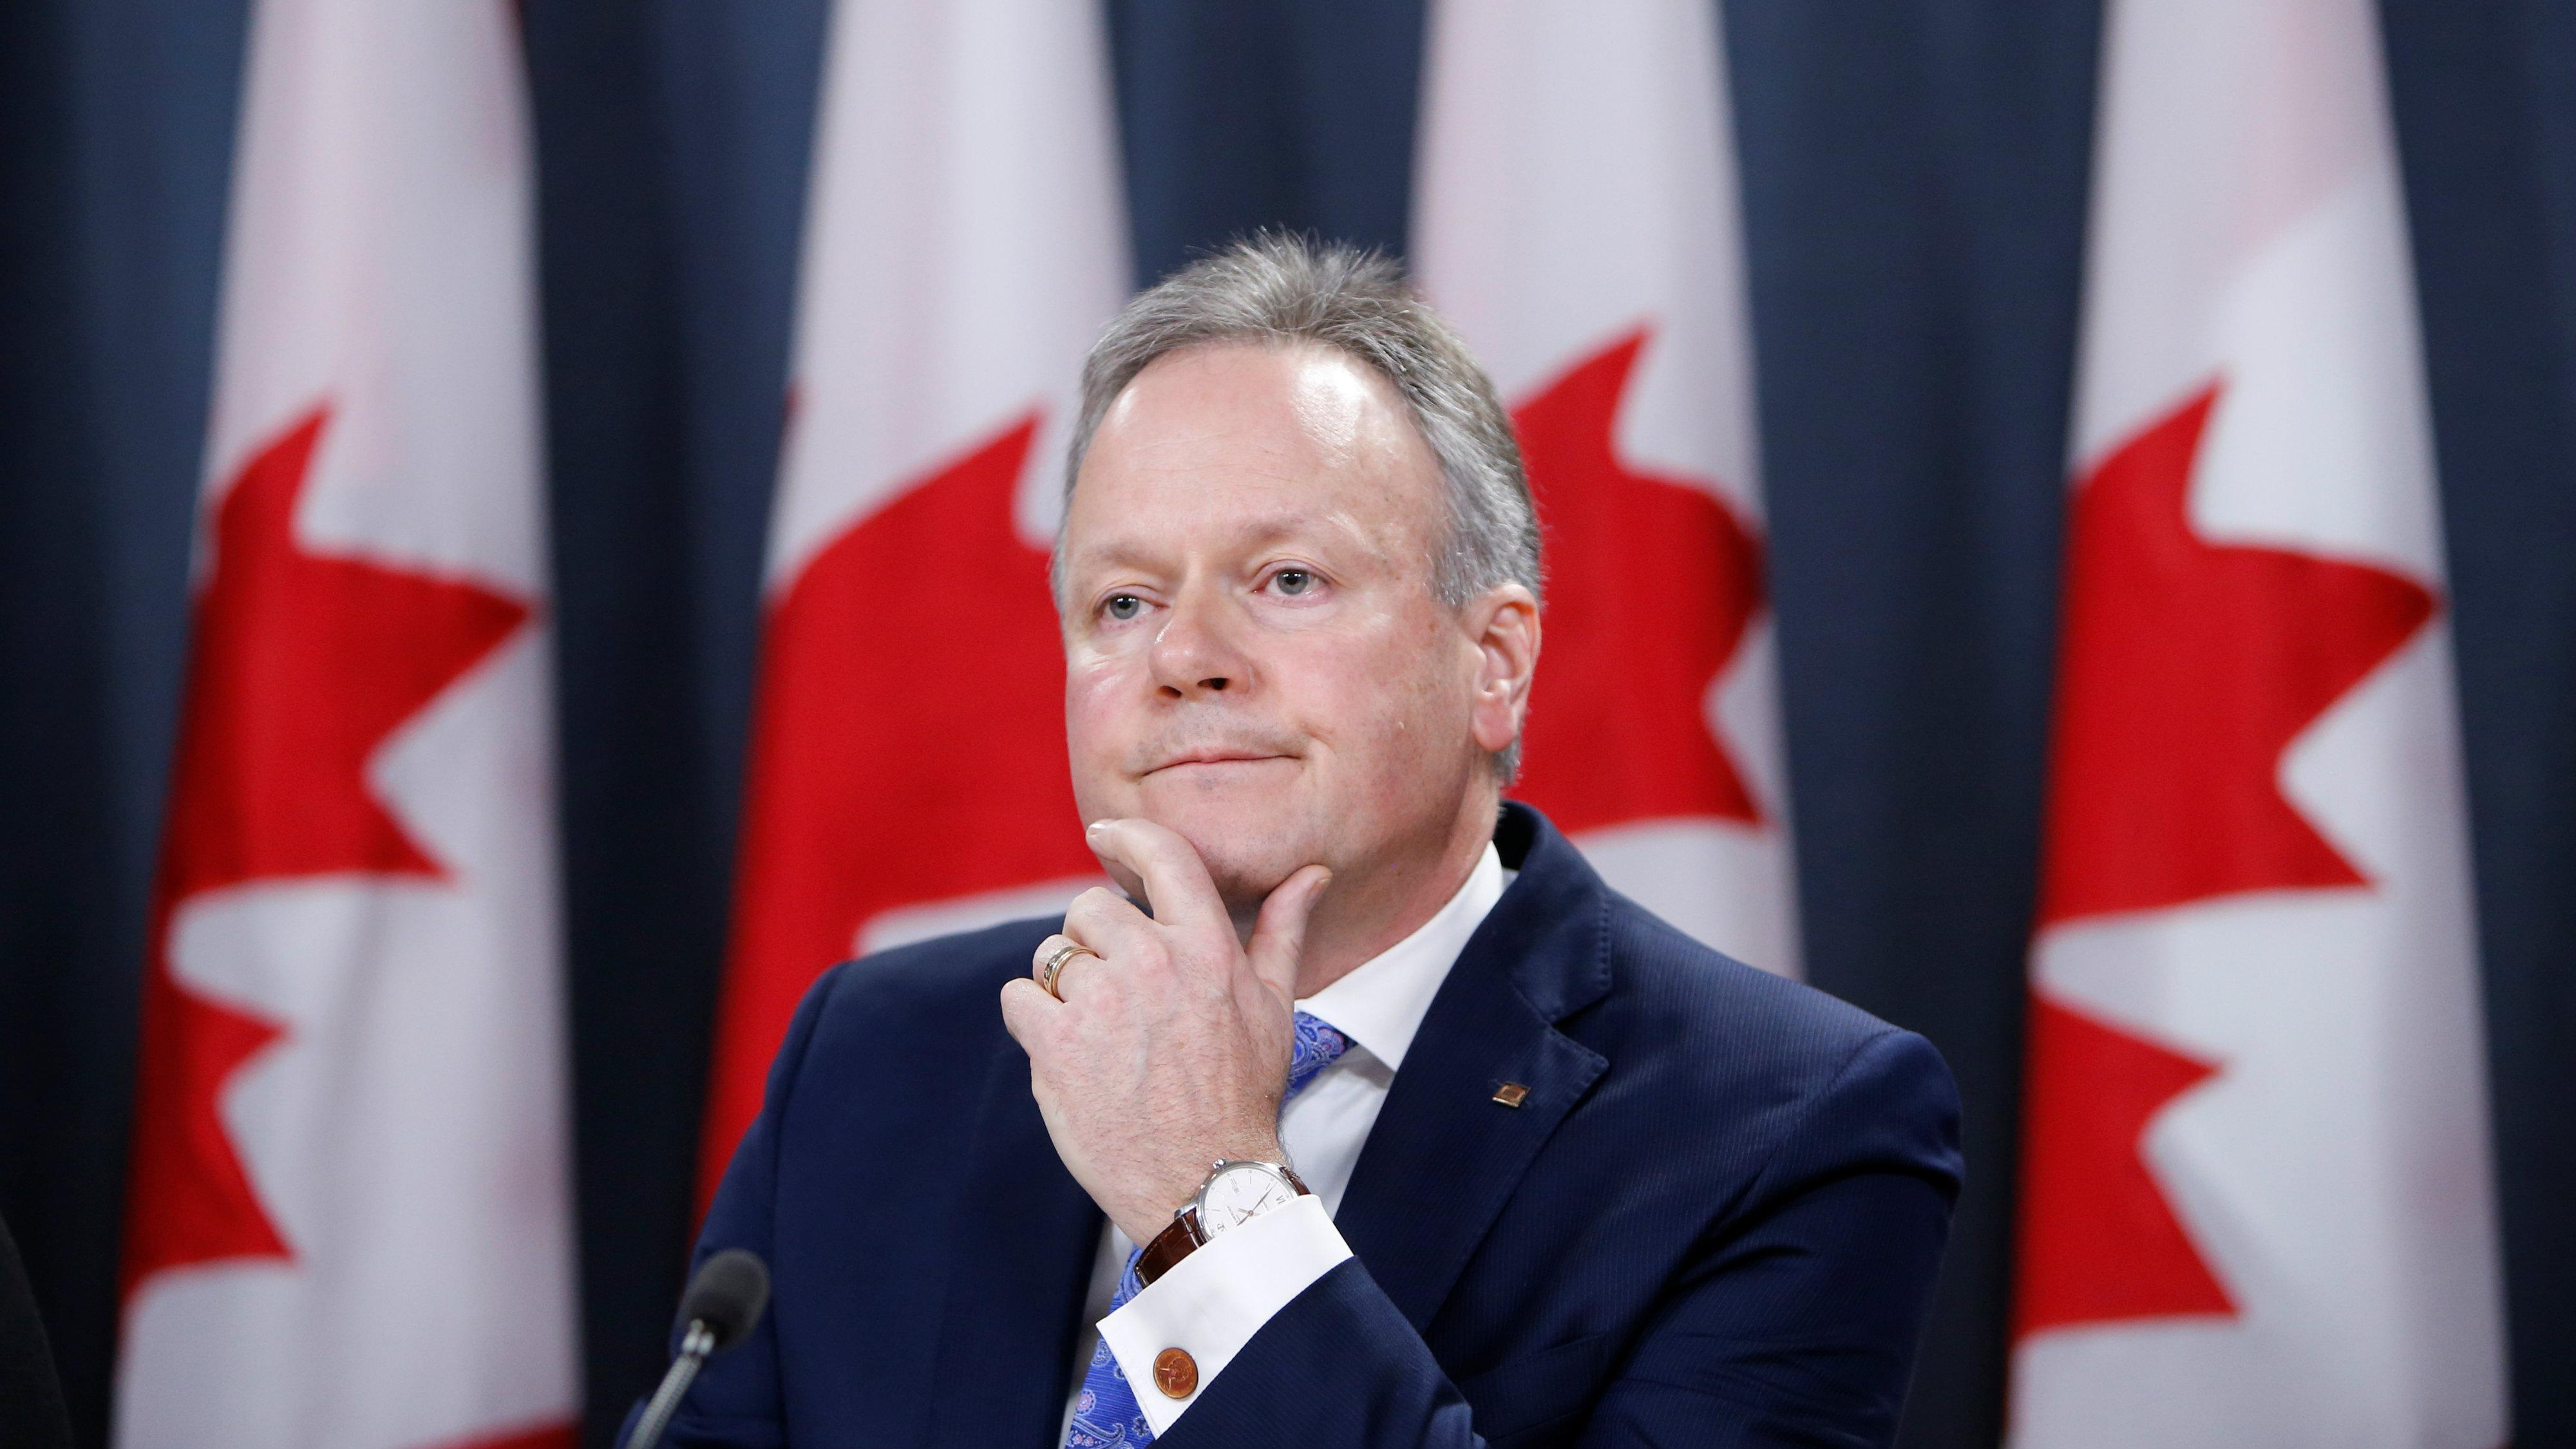 Bank of Canada Governor Stephen Poloz